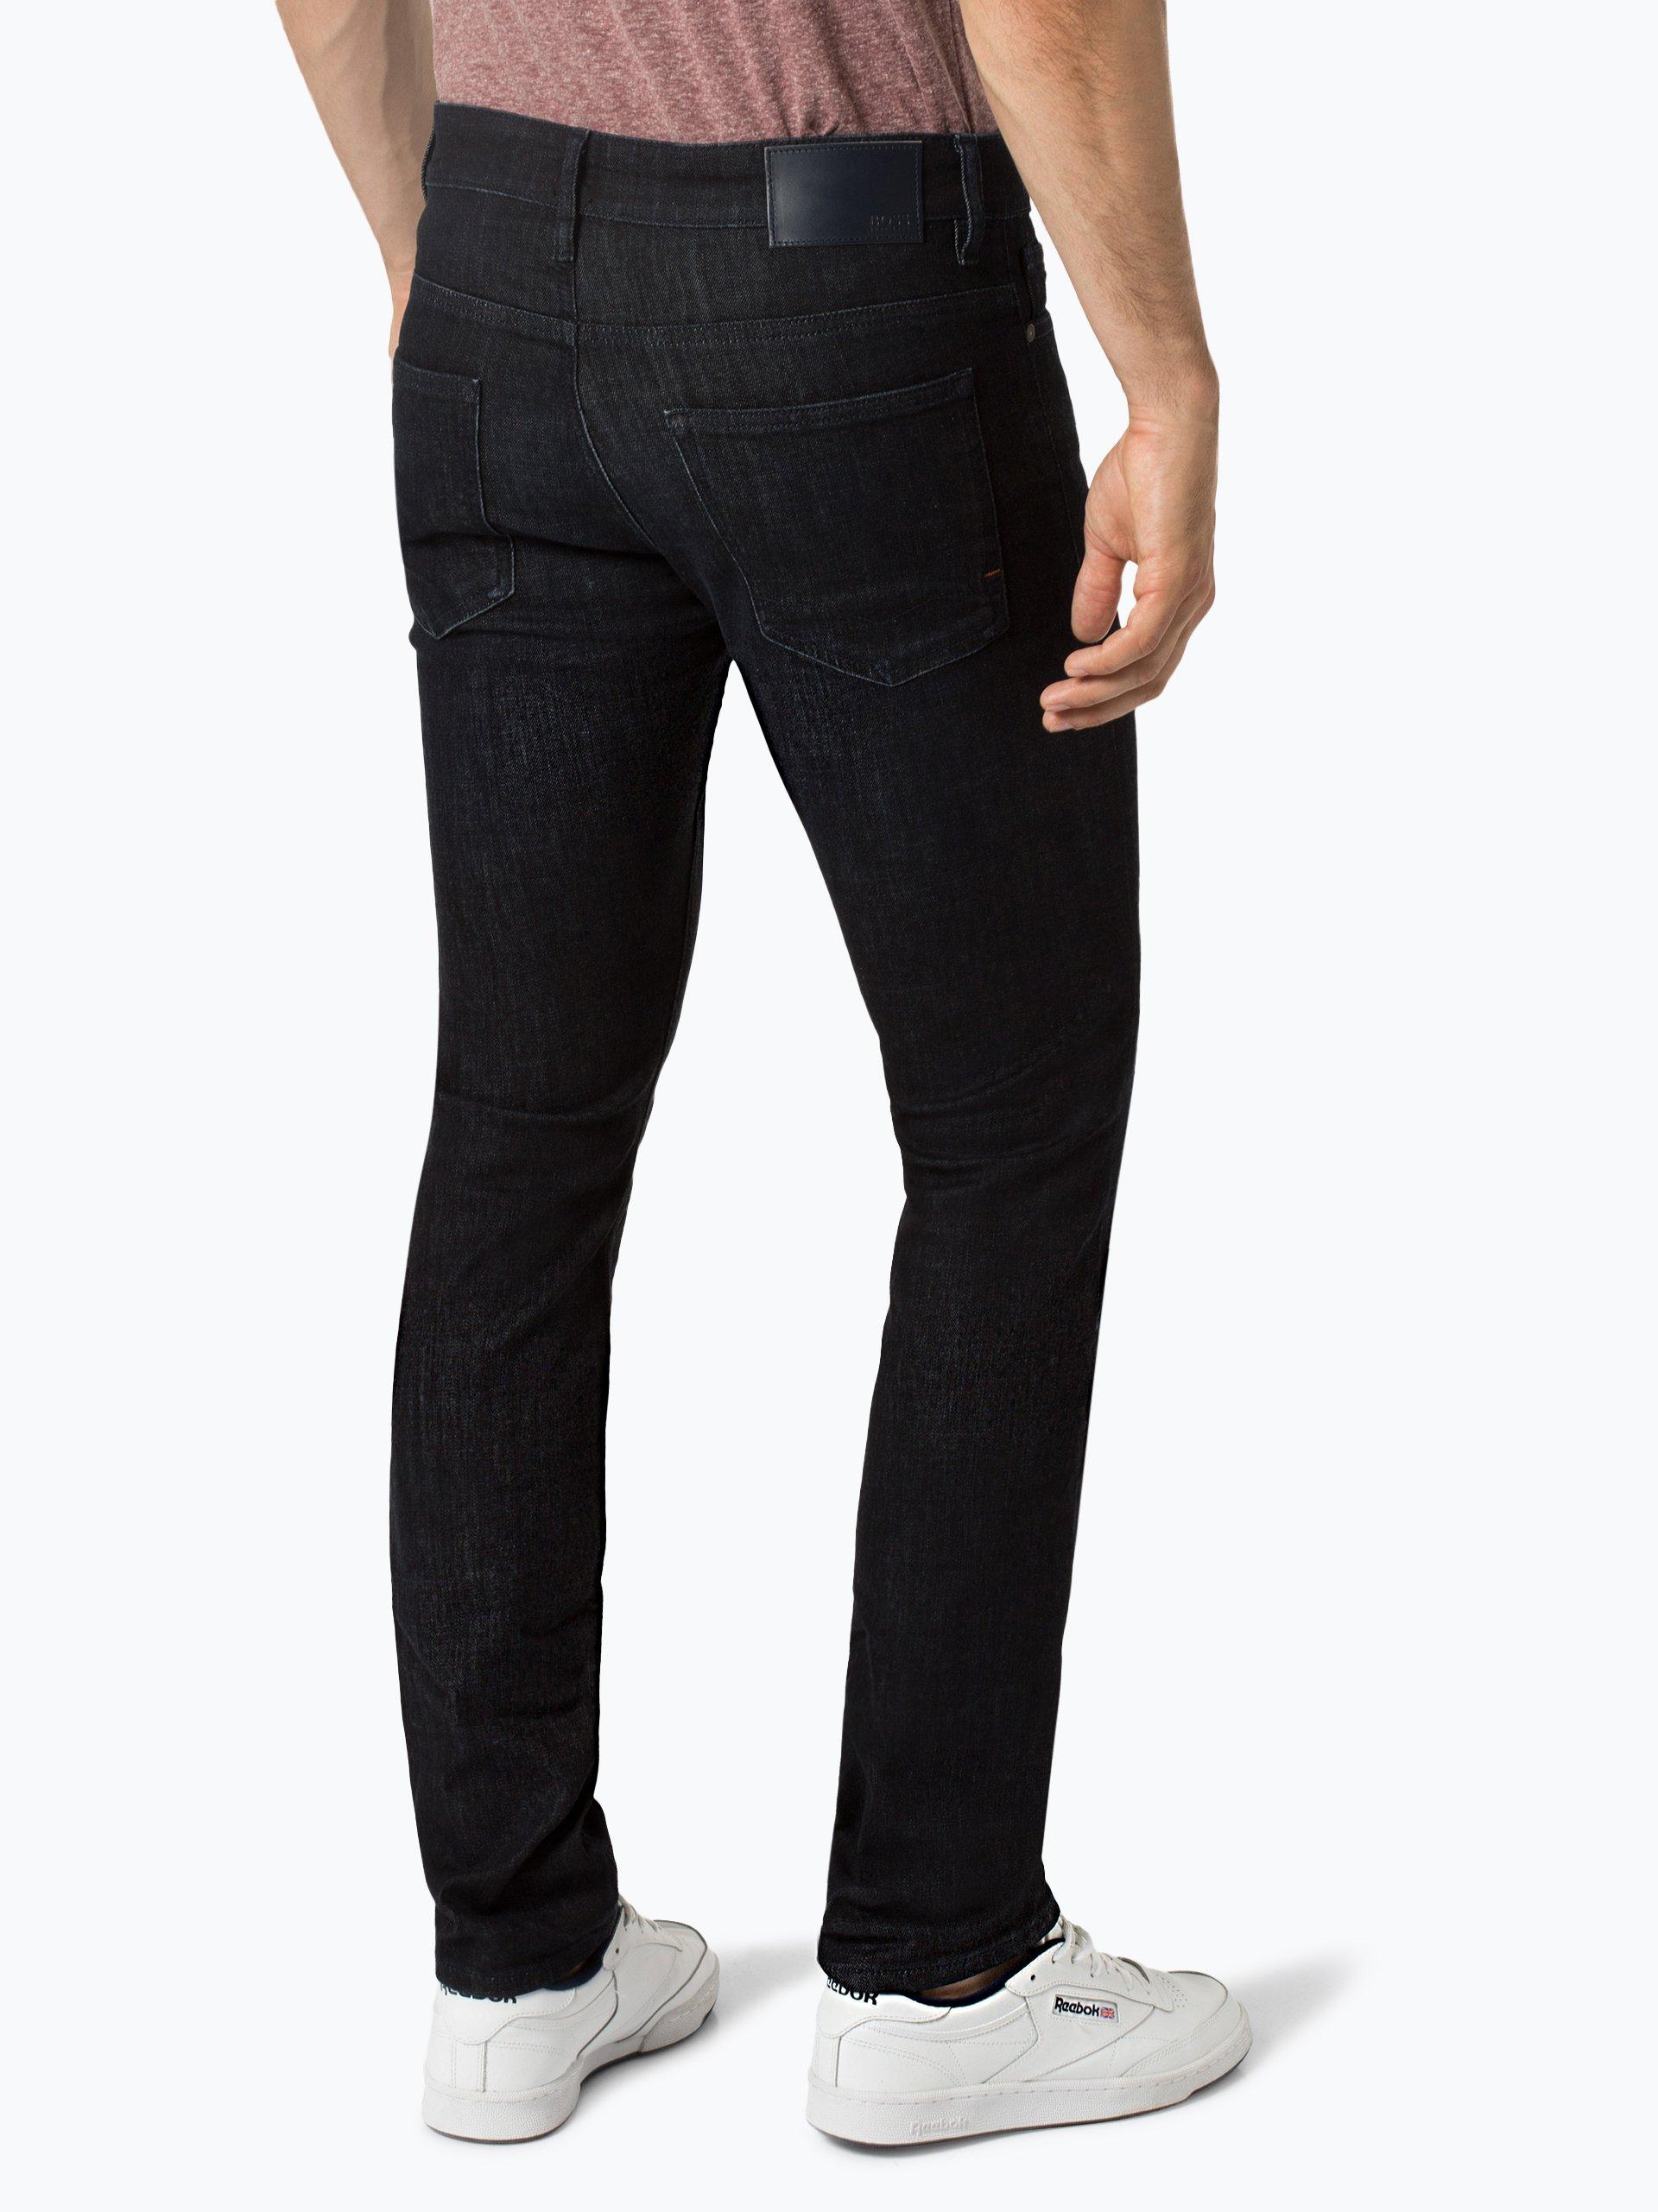 boss casual herren jeans delaware bc p dark stone uni online kaufen peek und cloppenburg de. Black Bedroom Furniture Sets. Home Design Ideas